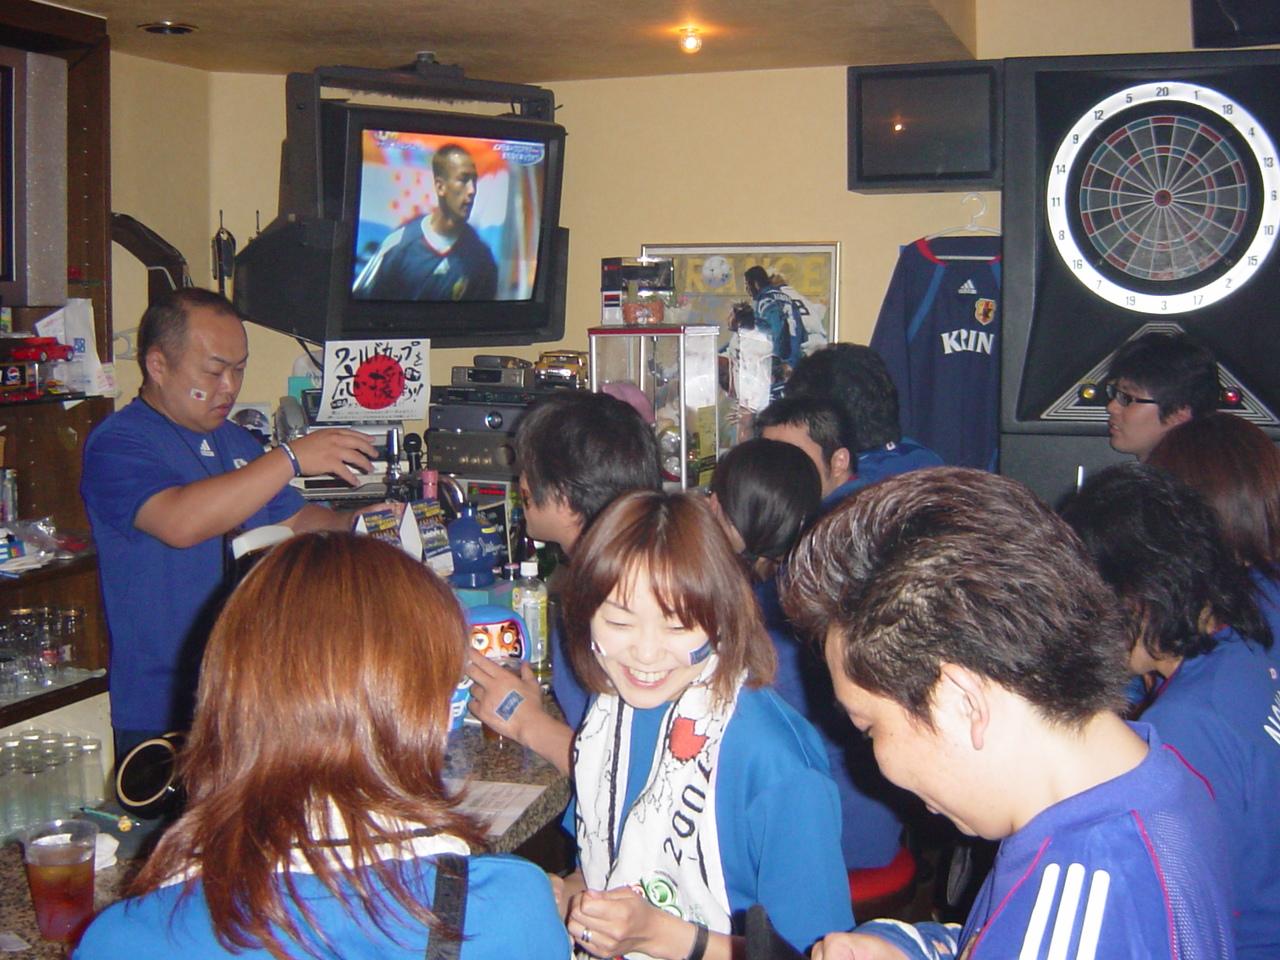 http://livedoor.blogimg.jp/akiramenai2005/imgs/1/8/1820784a.JPG?blog_id=497451